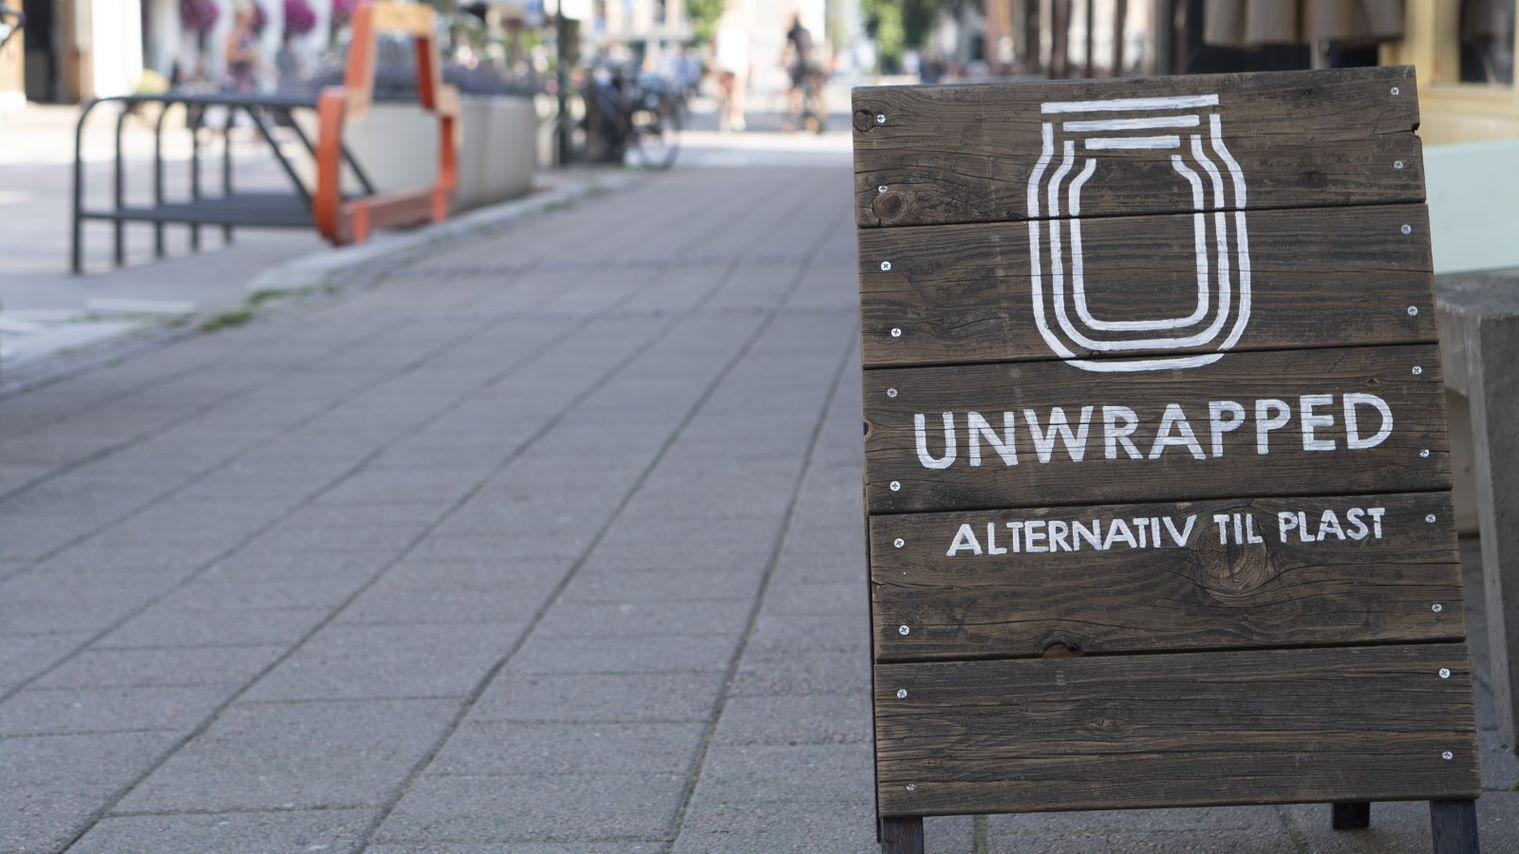 Unikum digger: Unwrapped